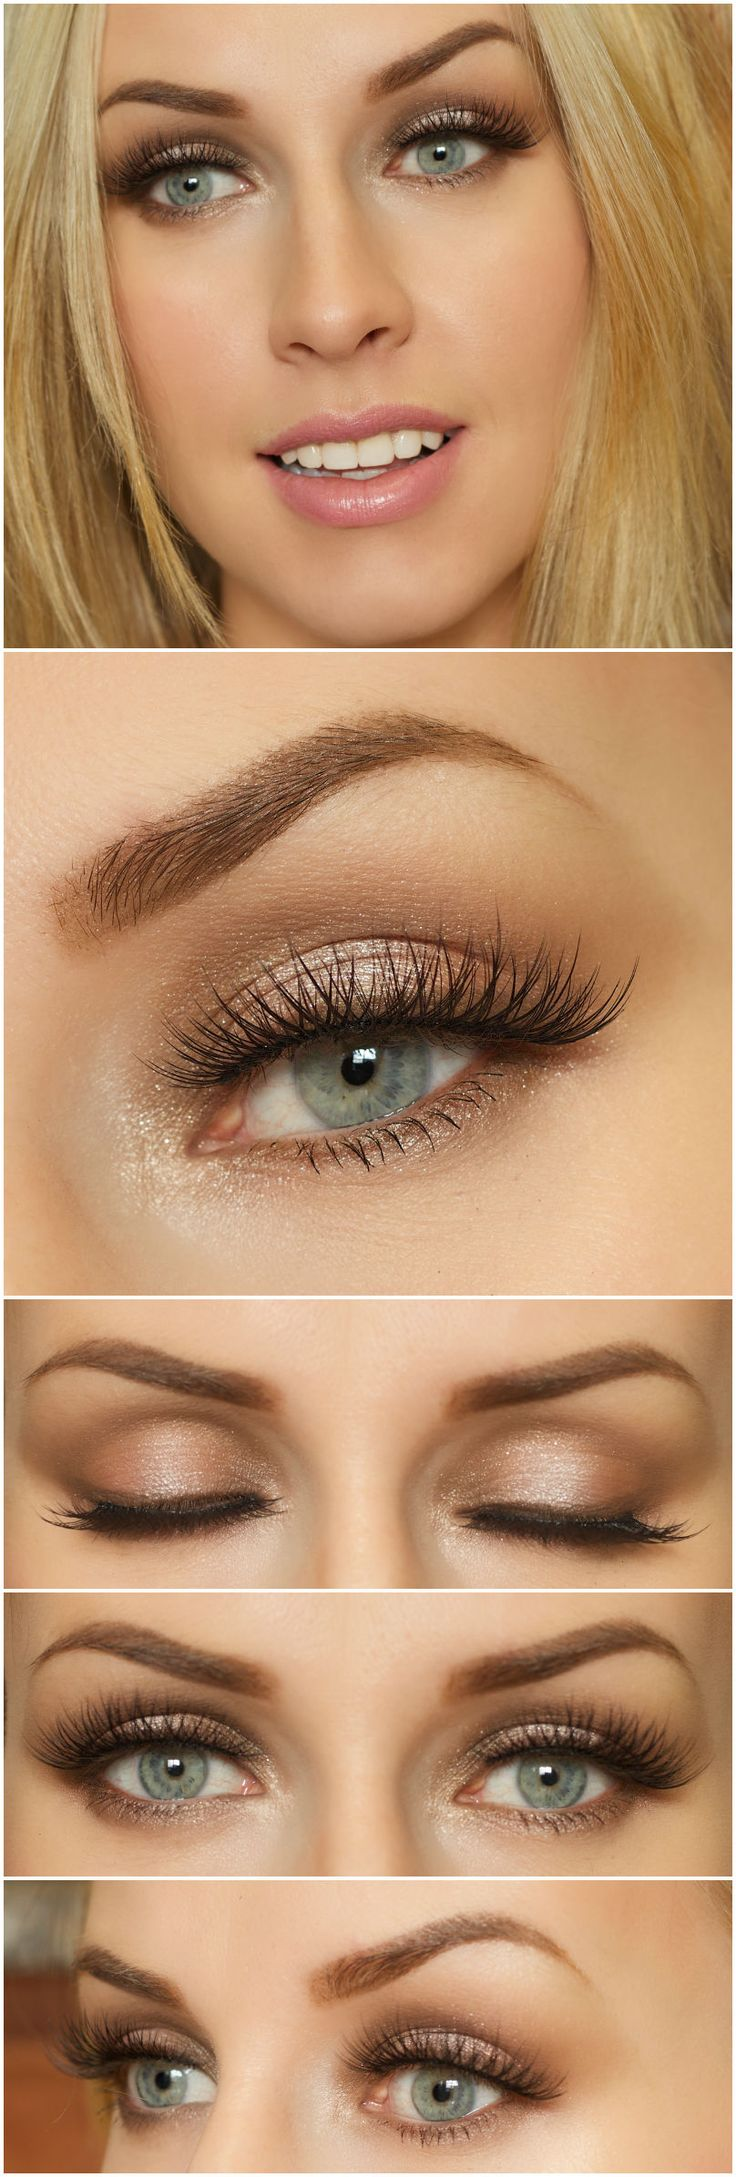 best ideas for makeup tutorials : best makeup tricks you can't live